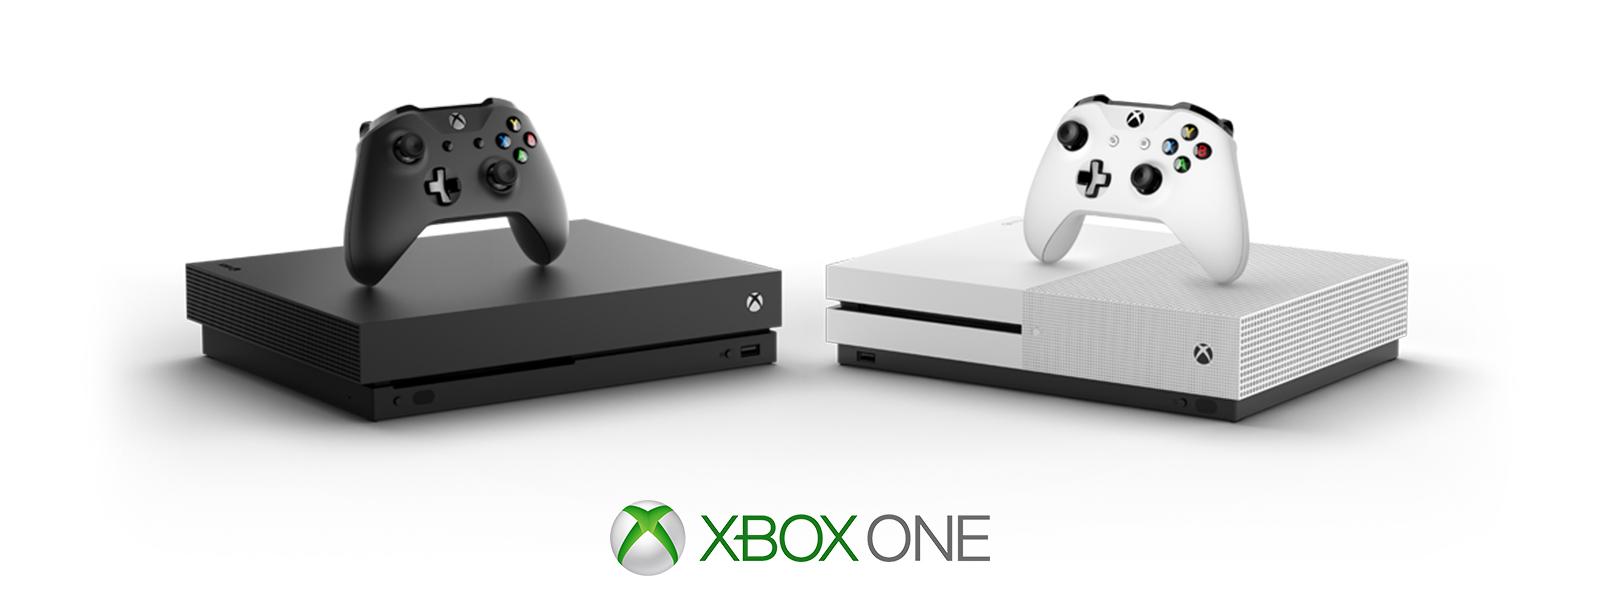 Xbox One X og Xbox One S